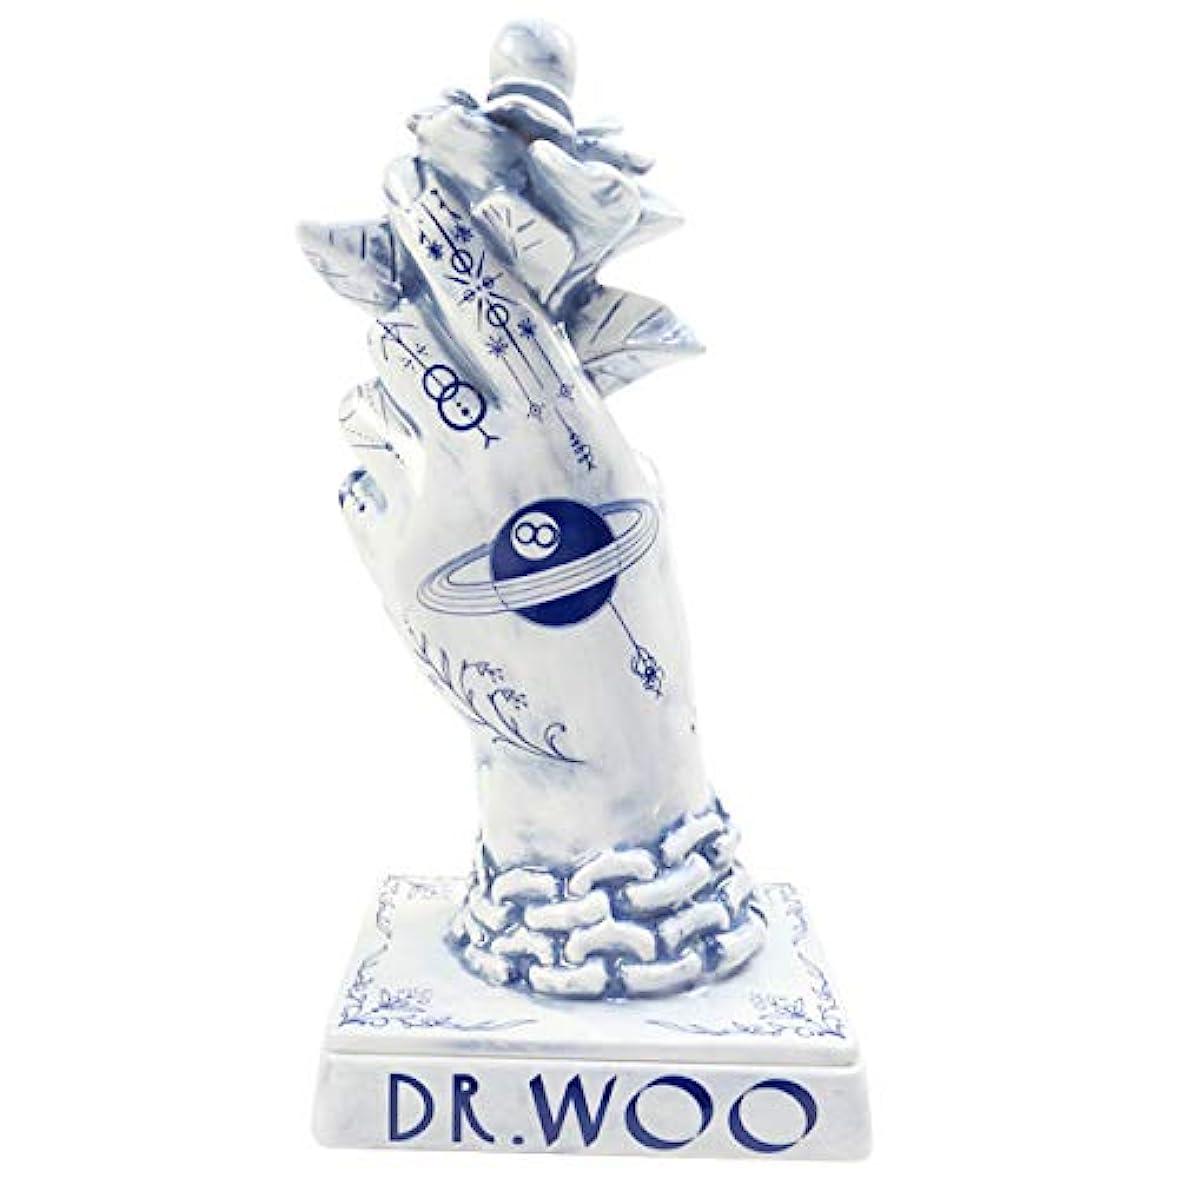 NEIGHBORHOOD ネイバーフッド 18AW ×Dr Woo BOOZE. DW/CE-INCENSE CHAMBER お香立て 青 フリー